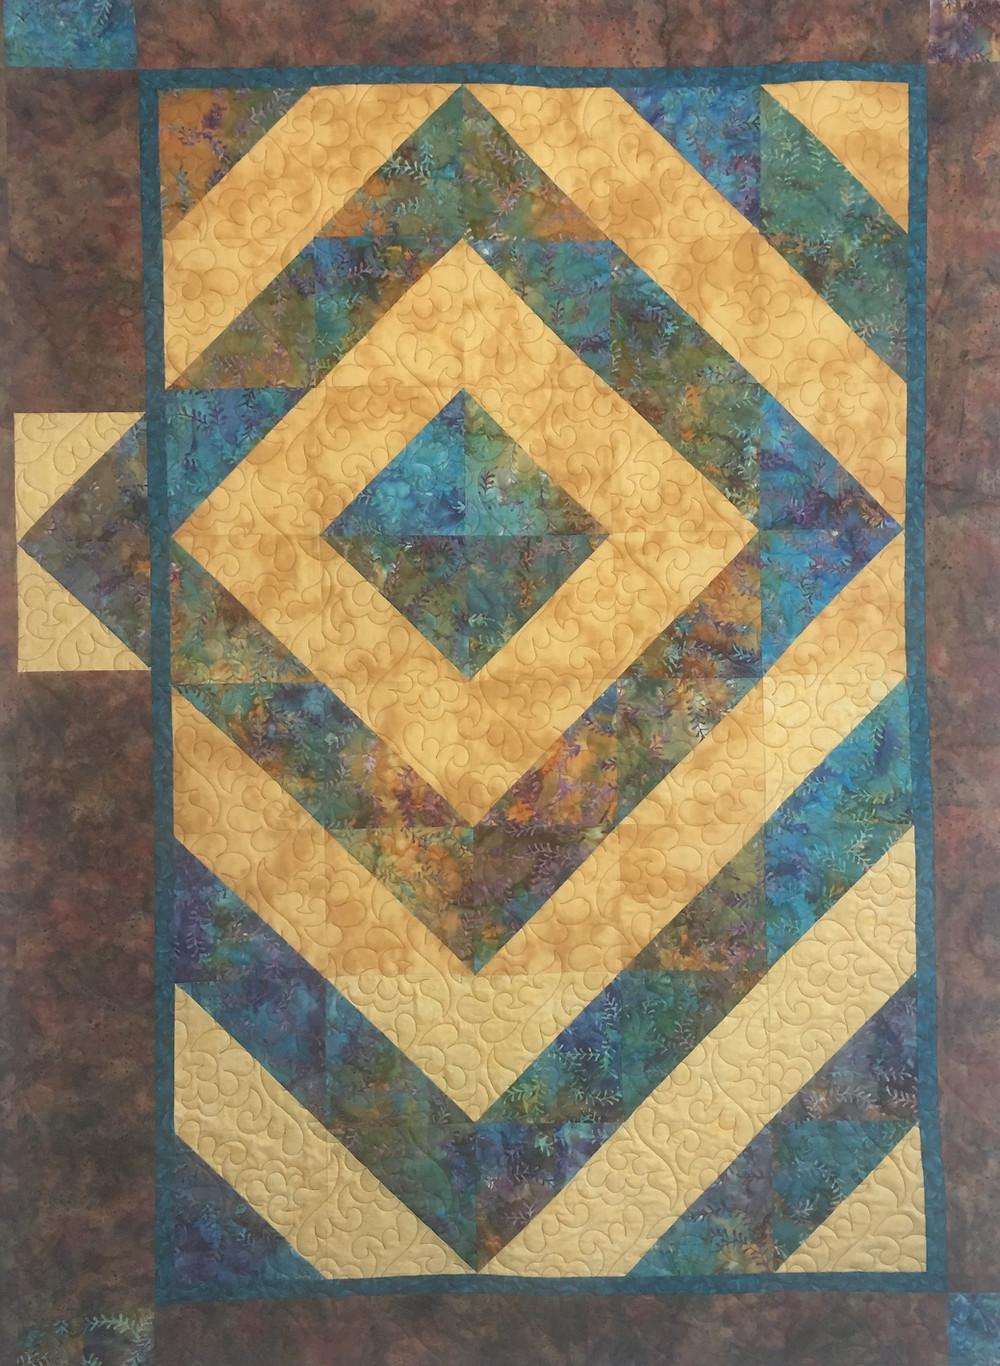 Her Own Original Design Quilt by Peggy Krebs